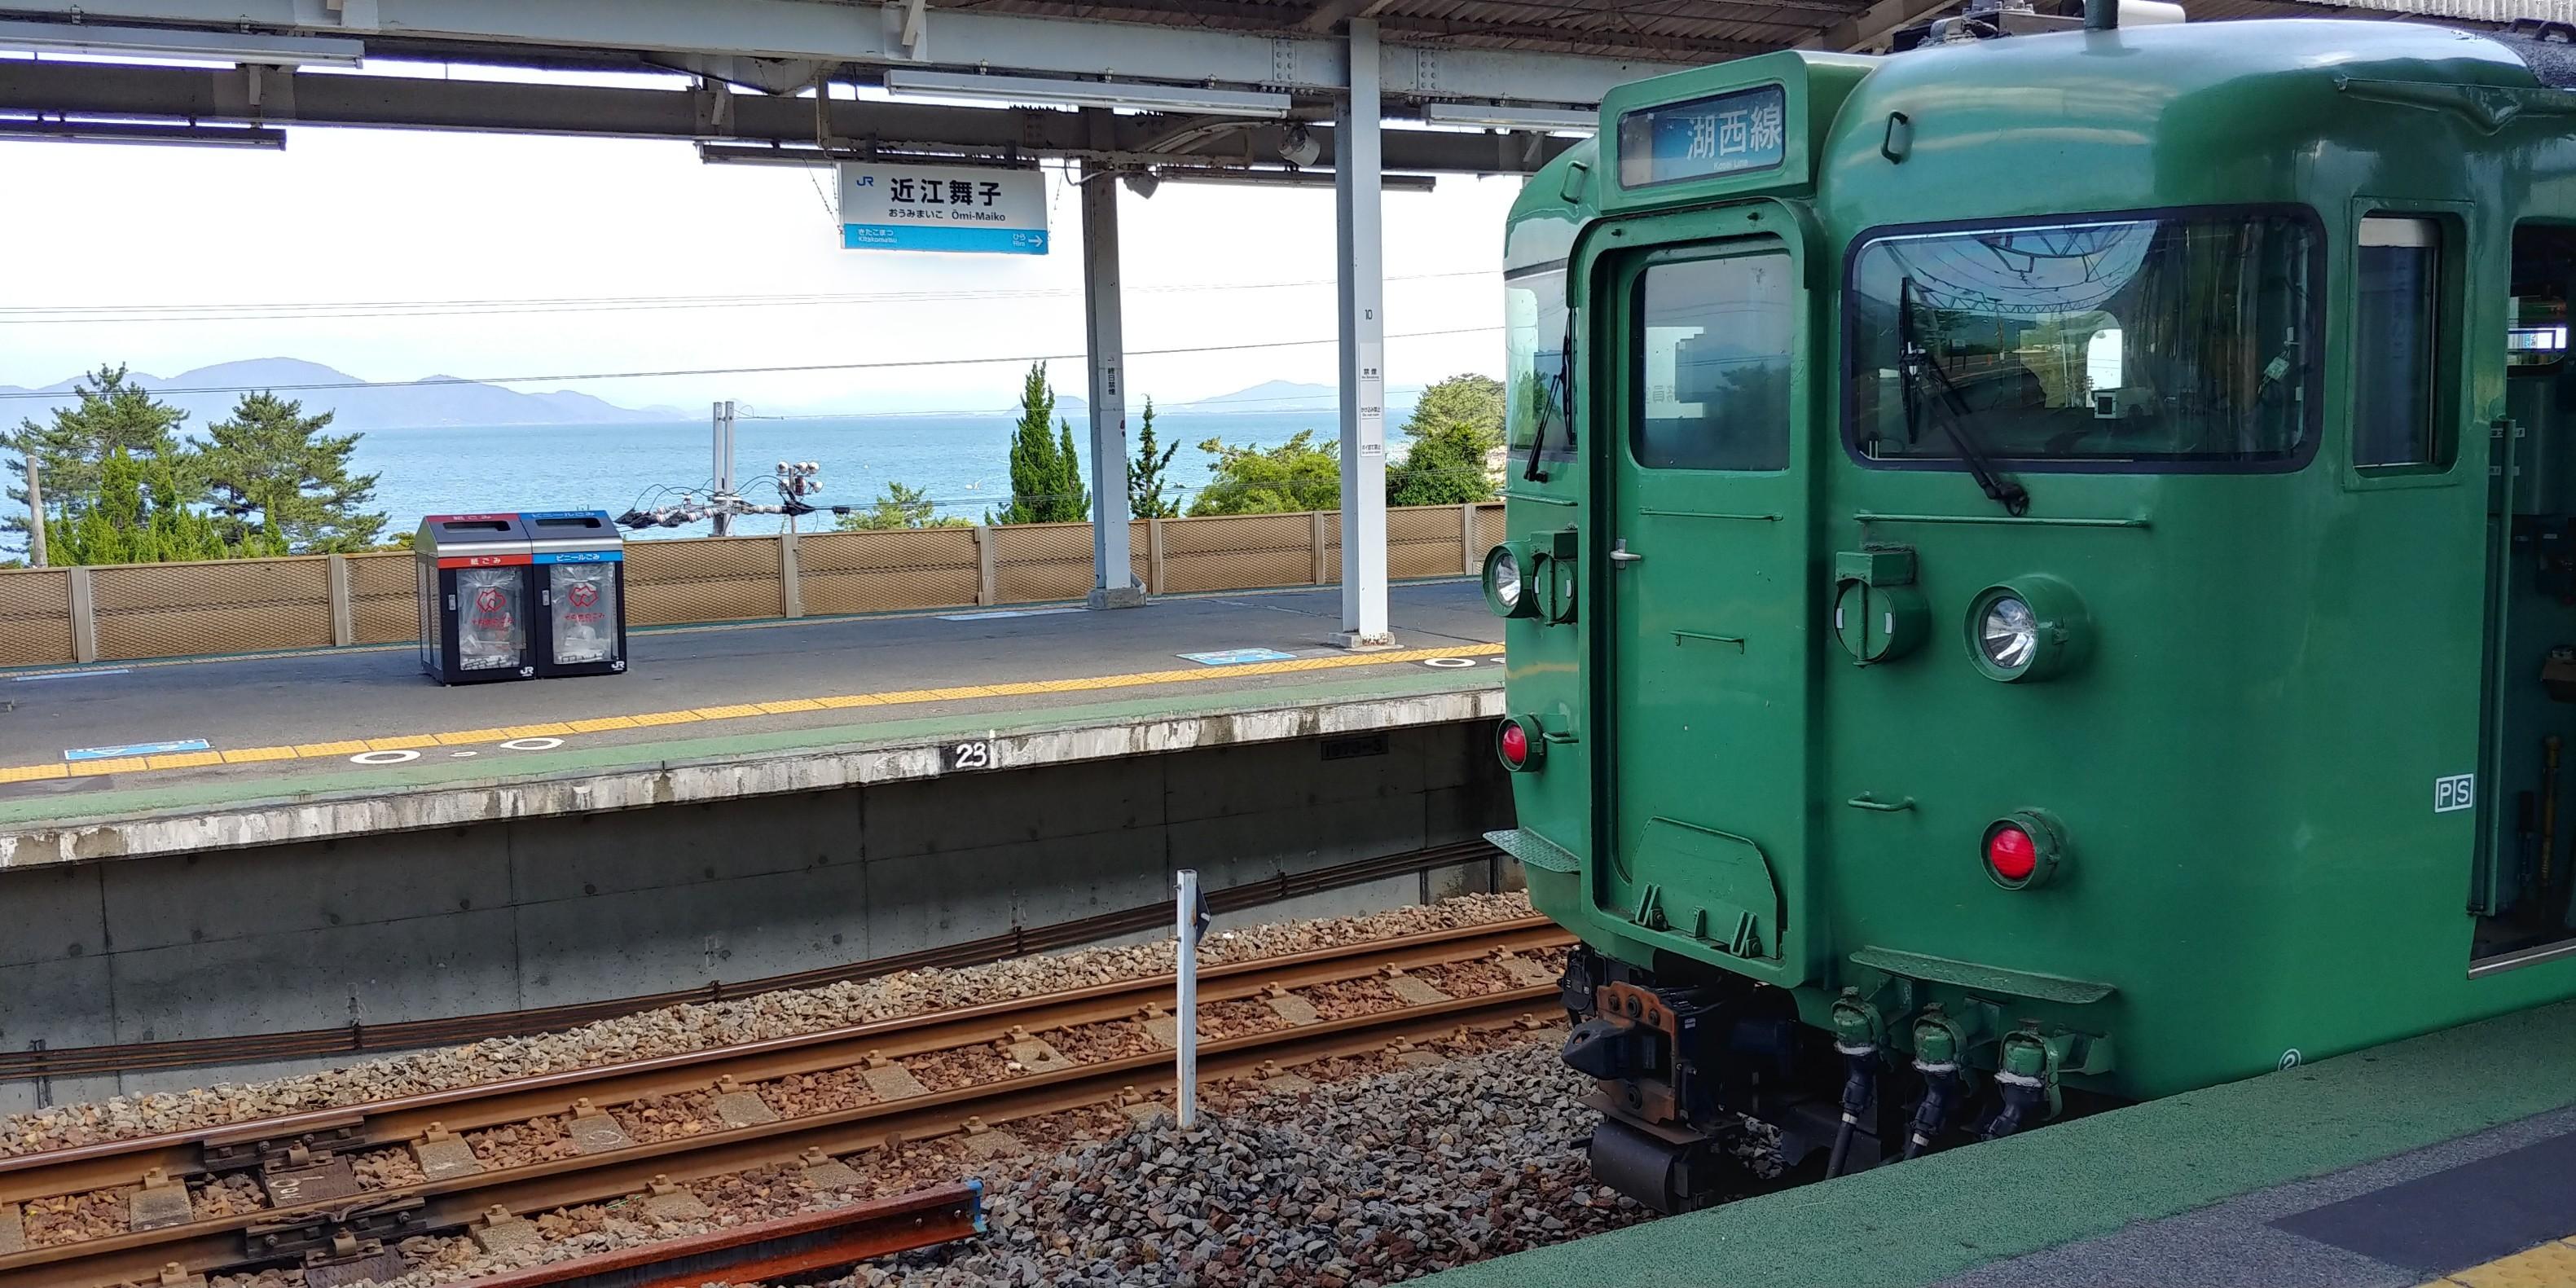 f:id:kishuji-kaisoku:20200122000905j:image